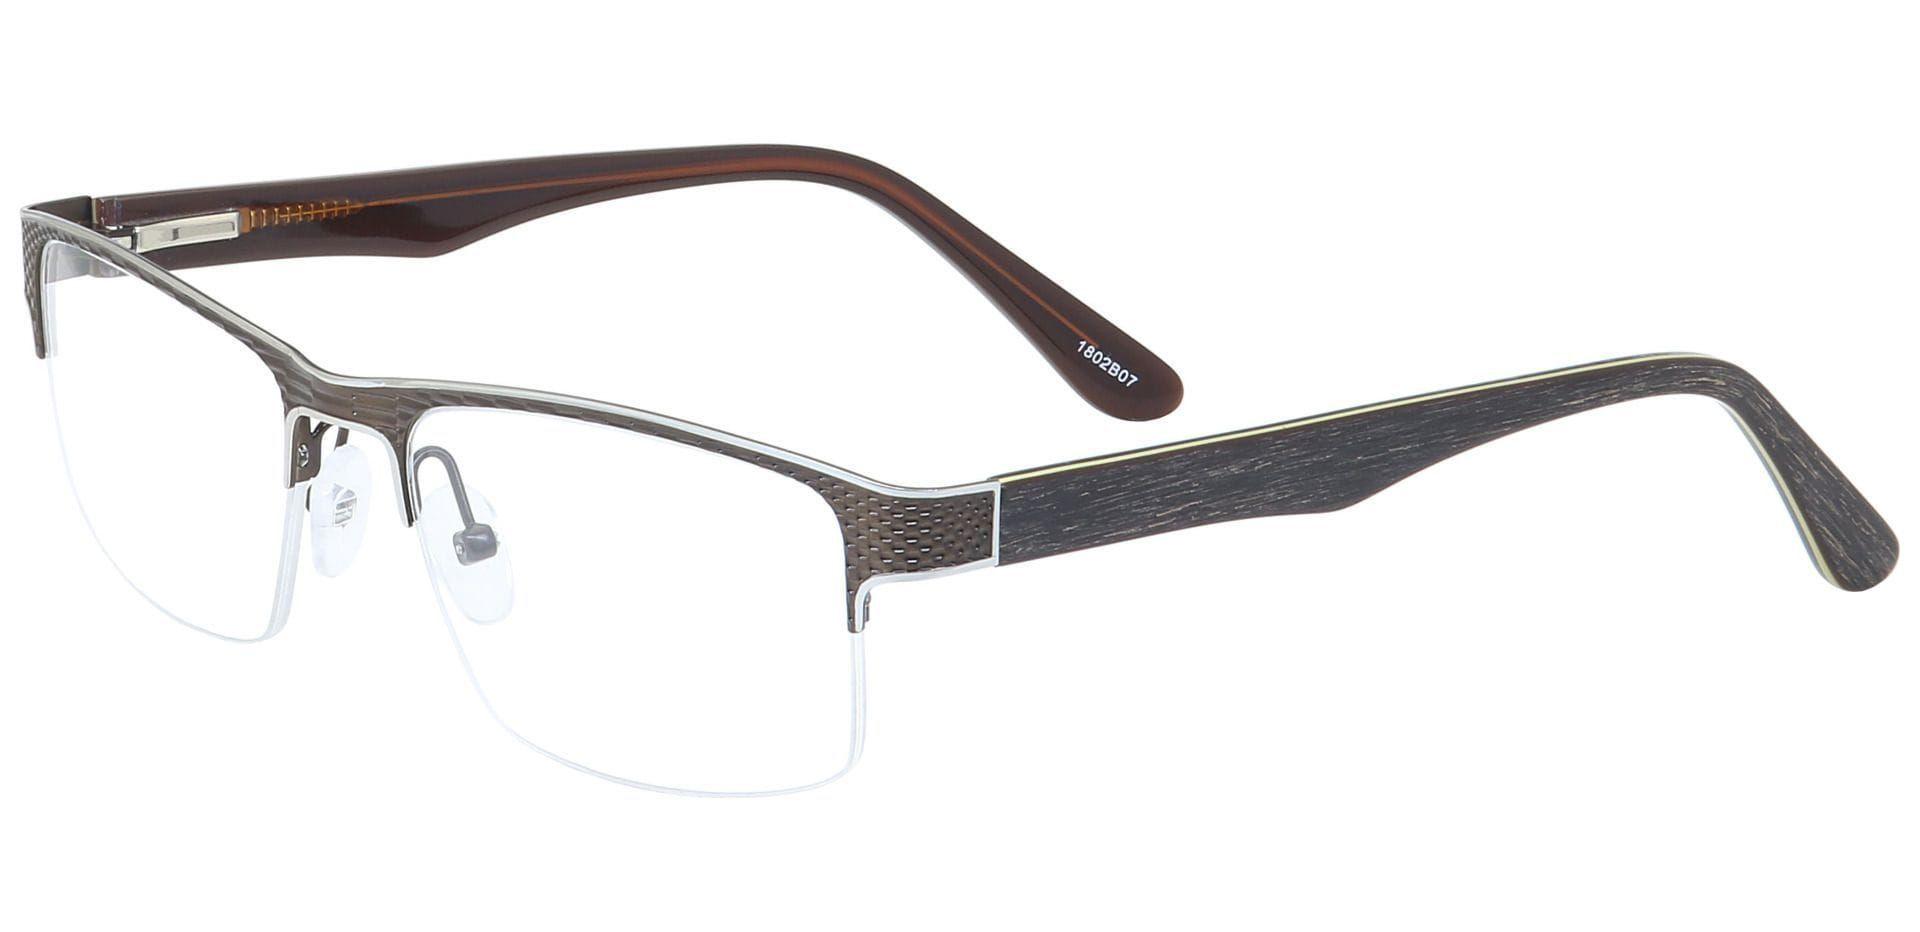 Rochelle Square Blue Light Blocking Glasses - Brown